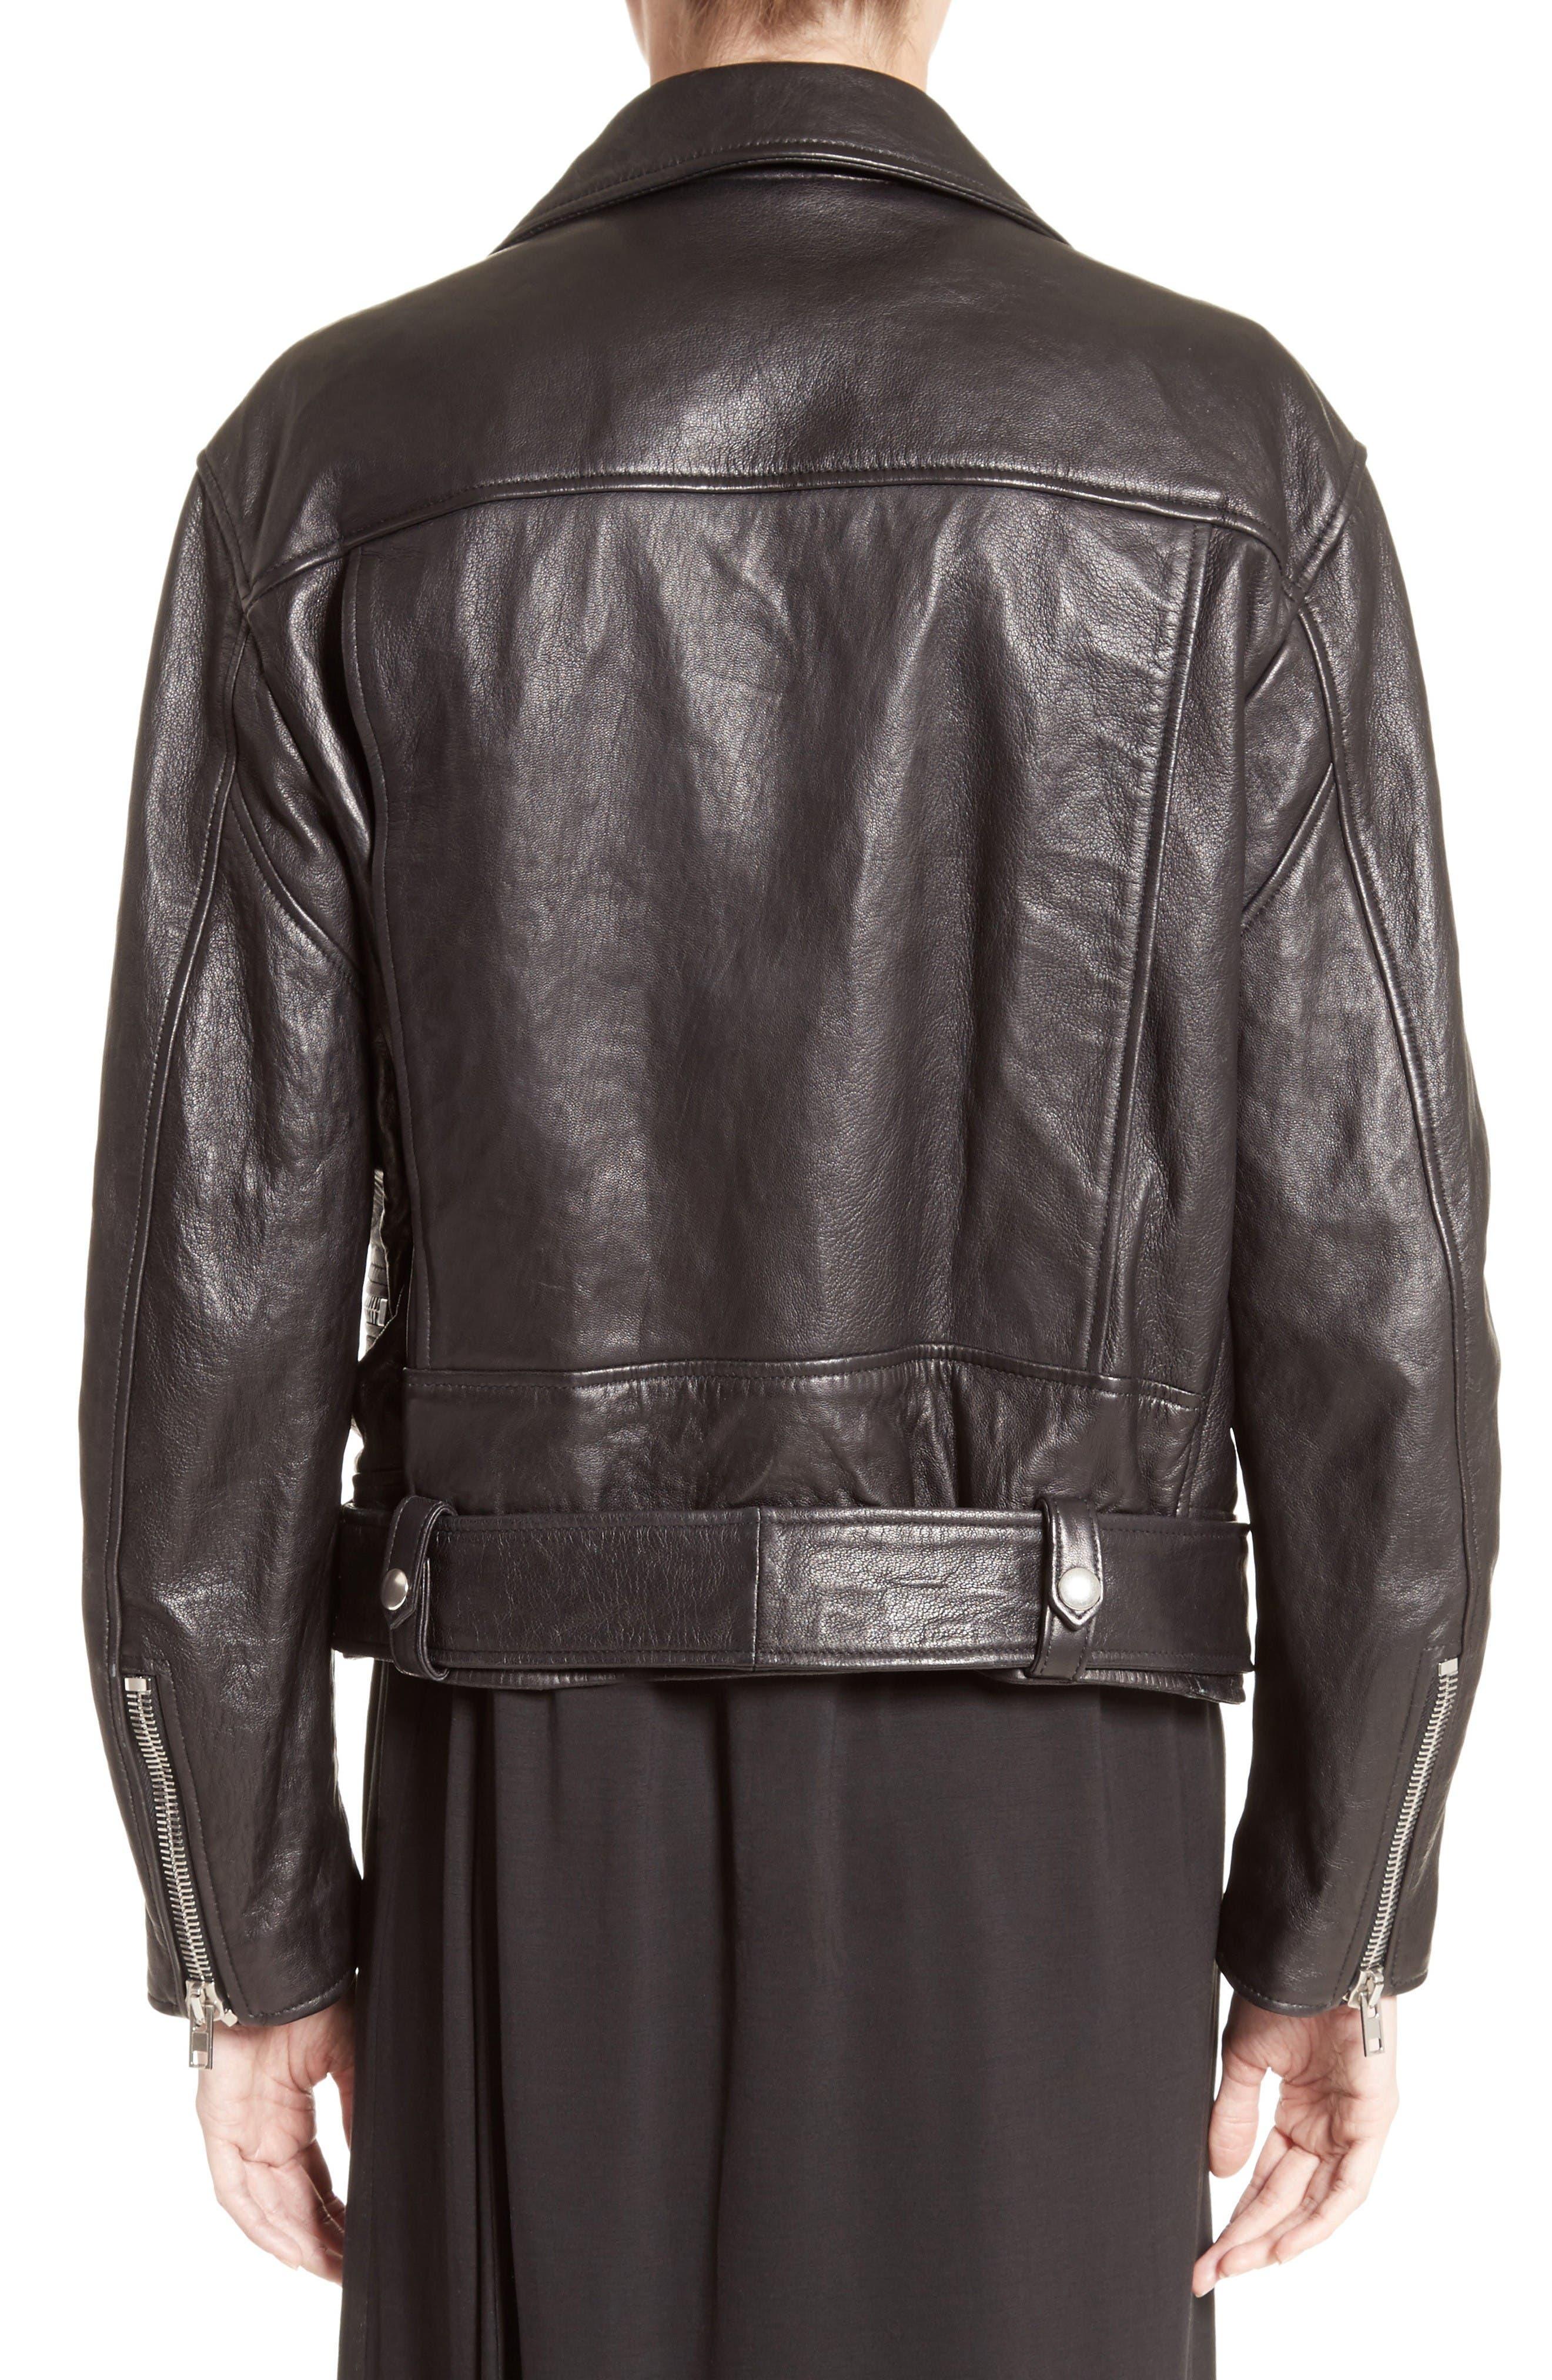 Merlyn Leather Jacket,                             Alternate thumbnail 2, color,                             Black